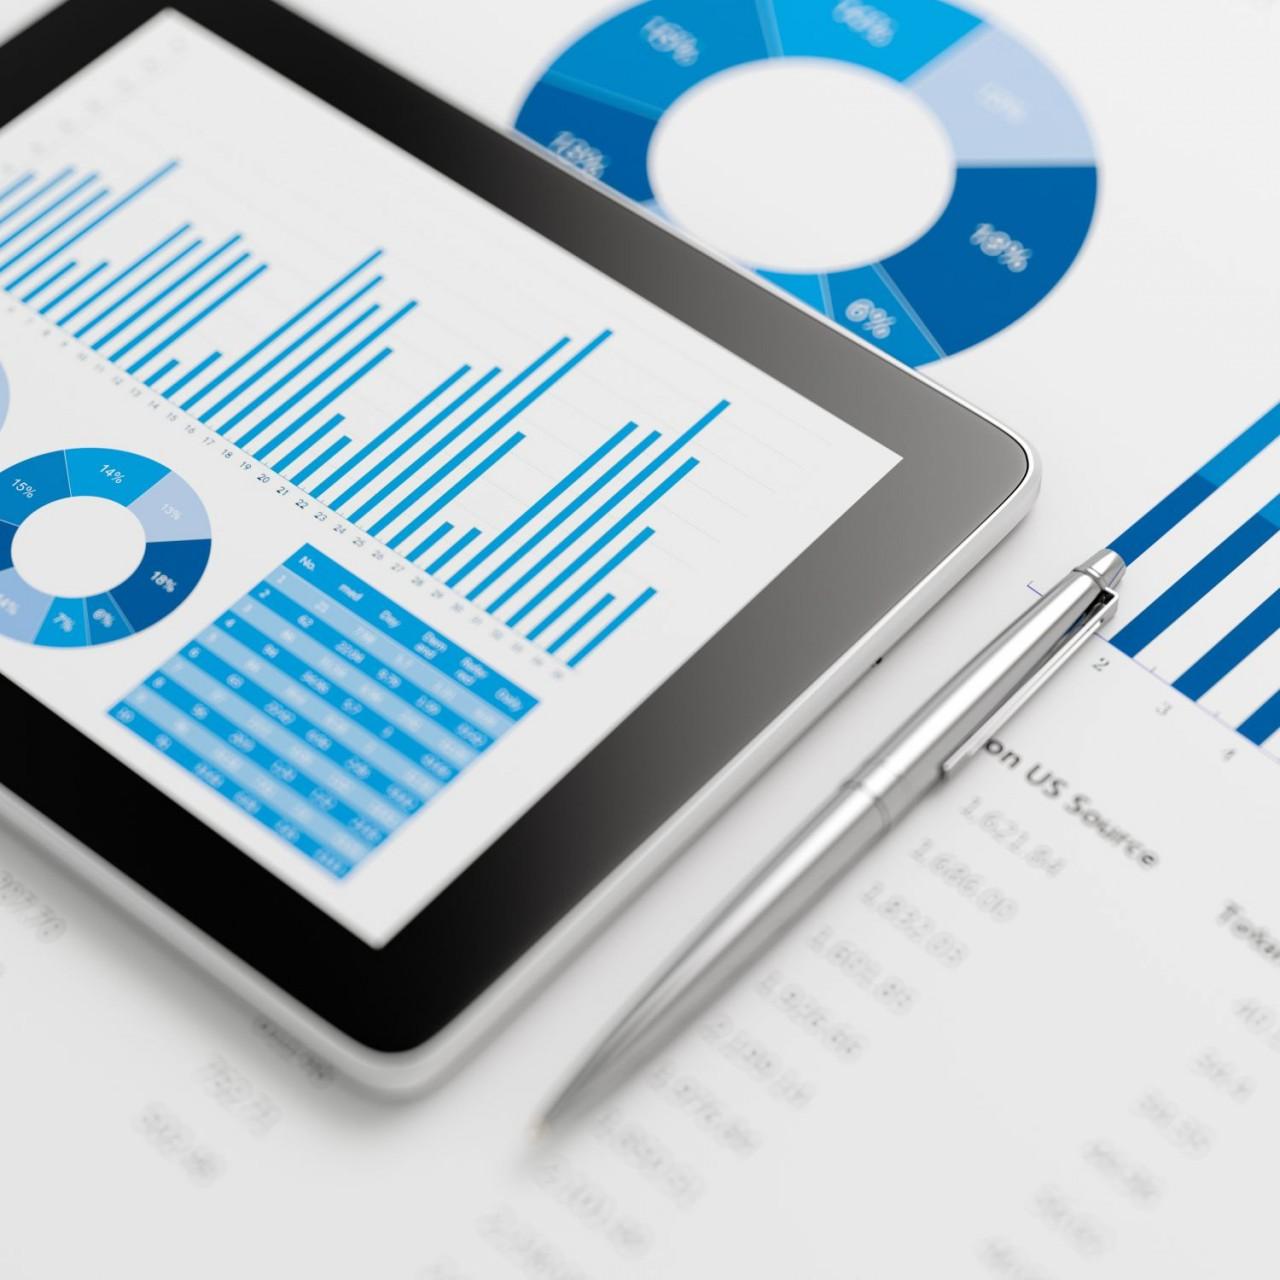 Being a marketer in a post-analytics world